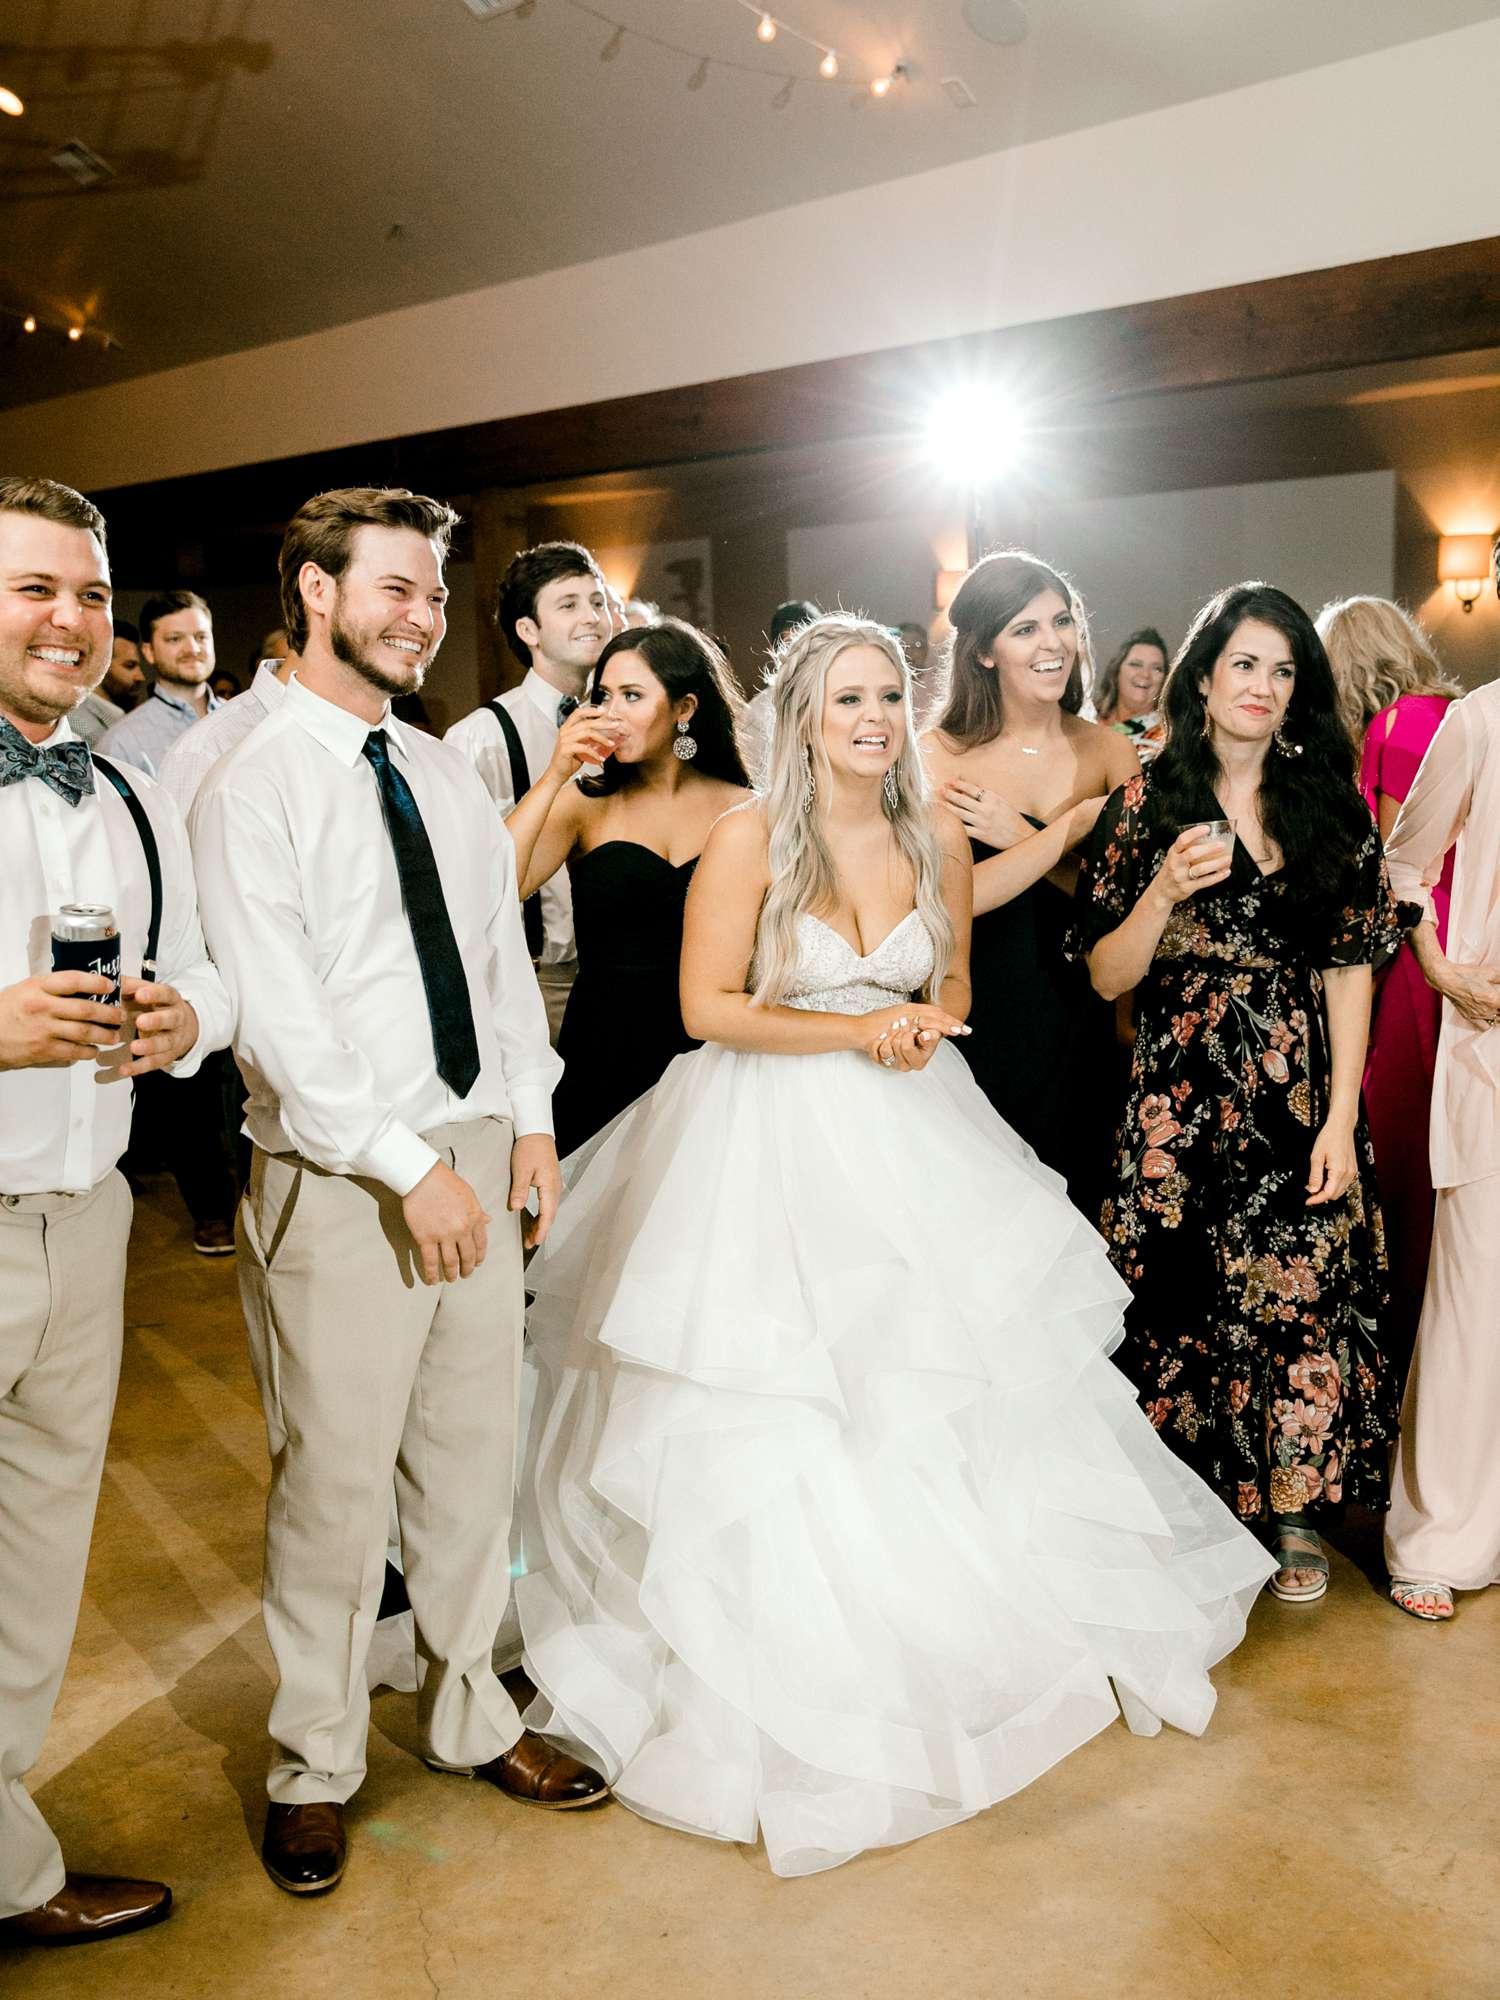 HAYLEE+JUSTIN+GREGORY+HERITAGE_HAUS_AUSTIN_TEXAS_WEDDING_0205.jpg